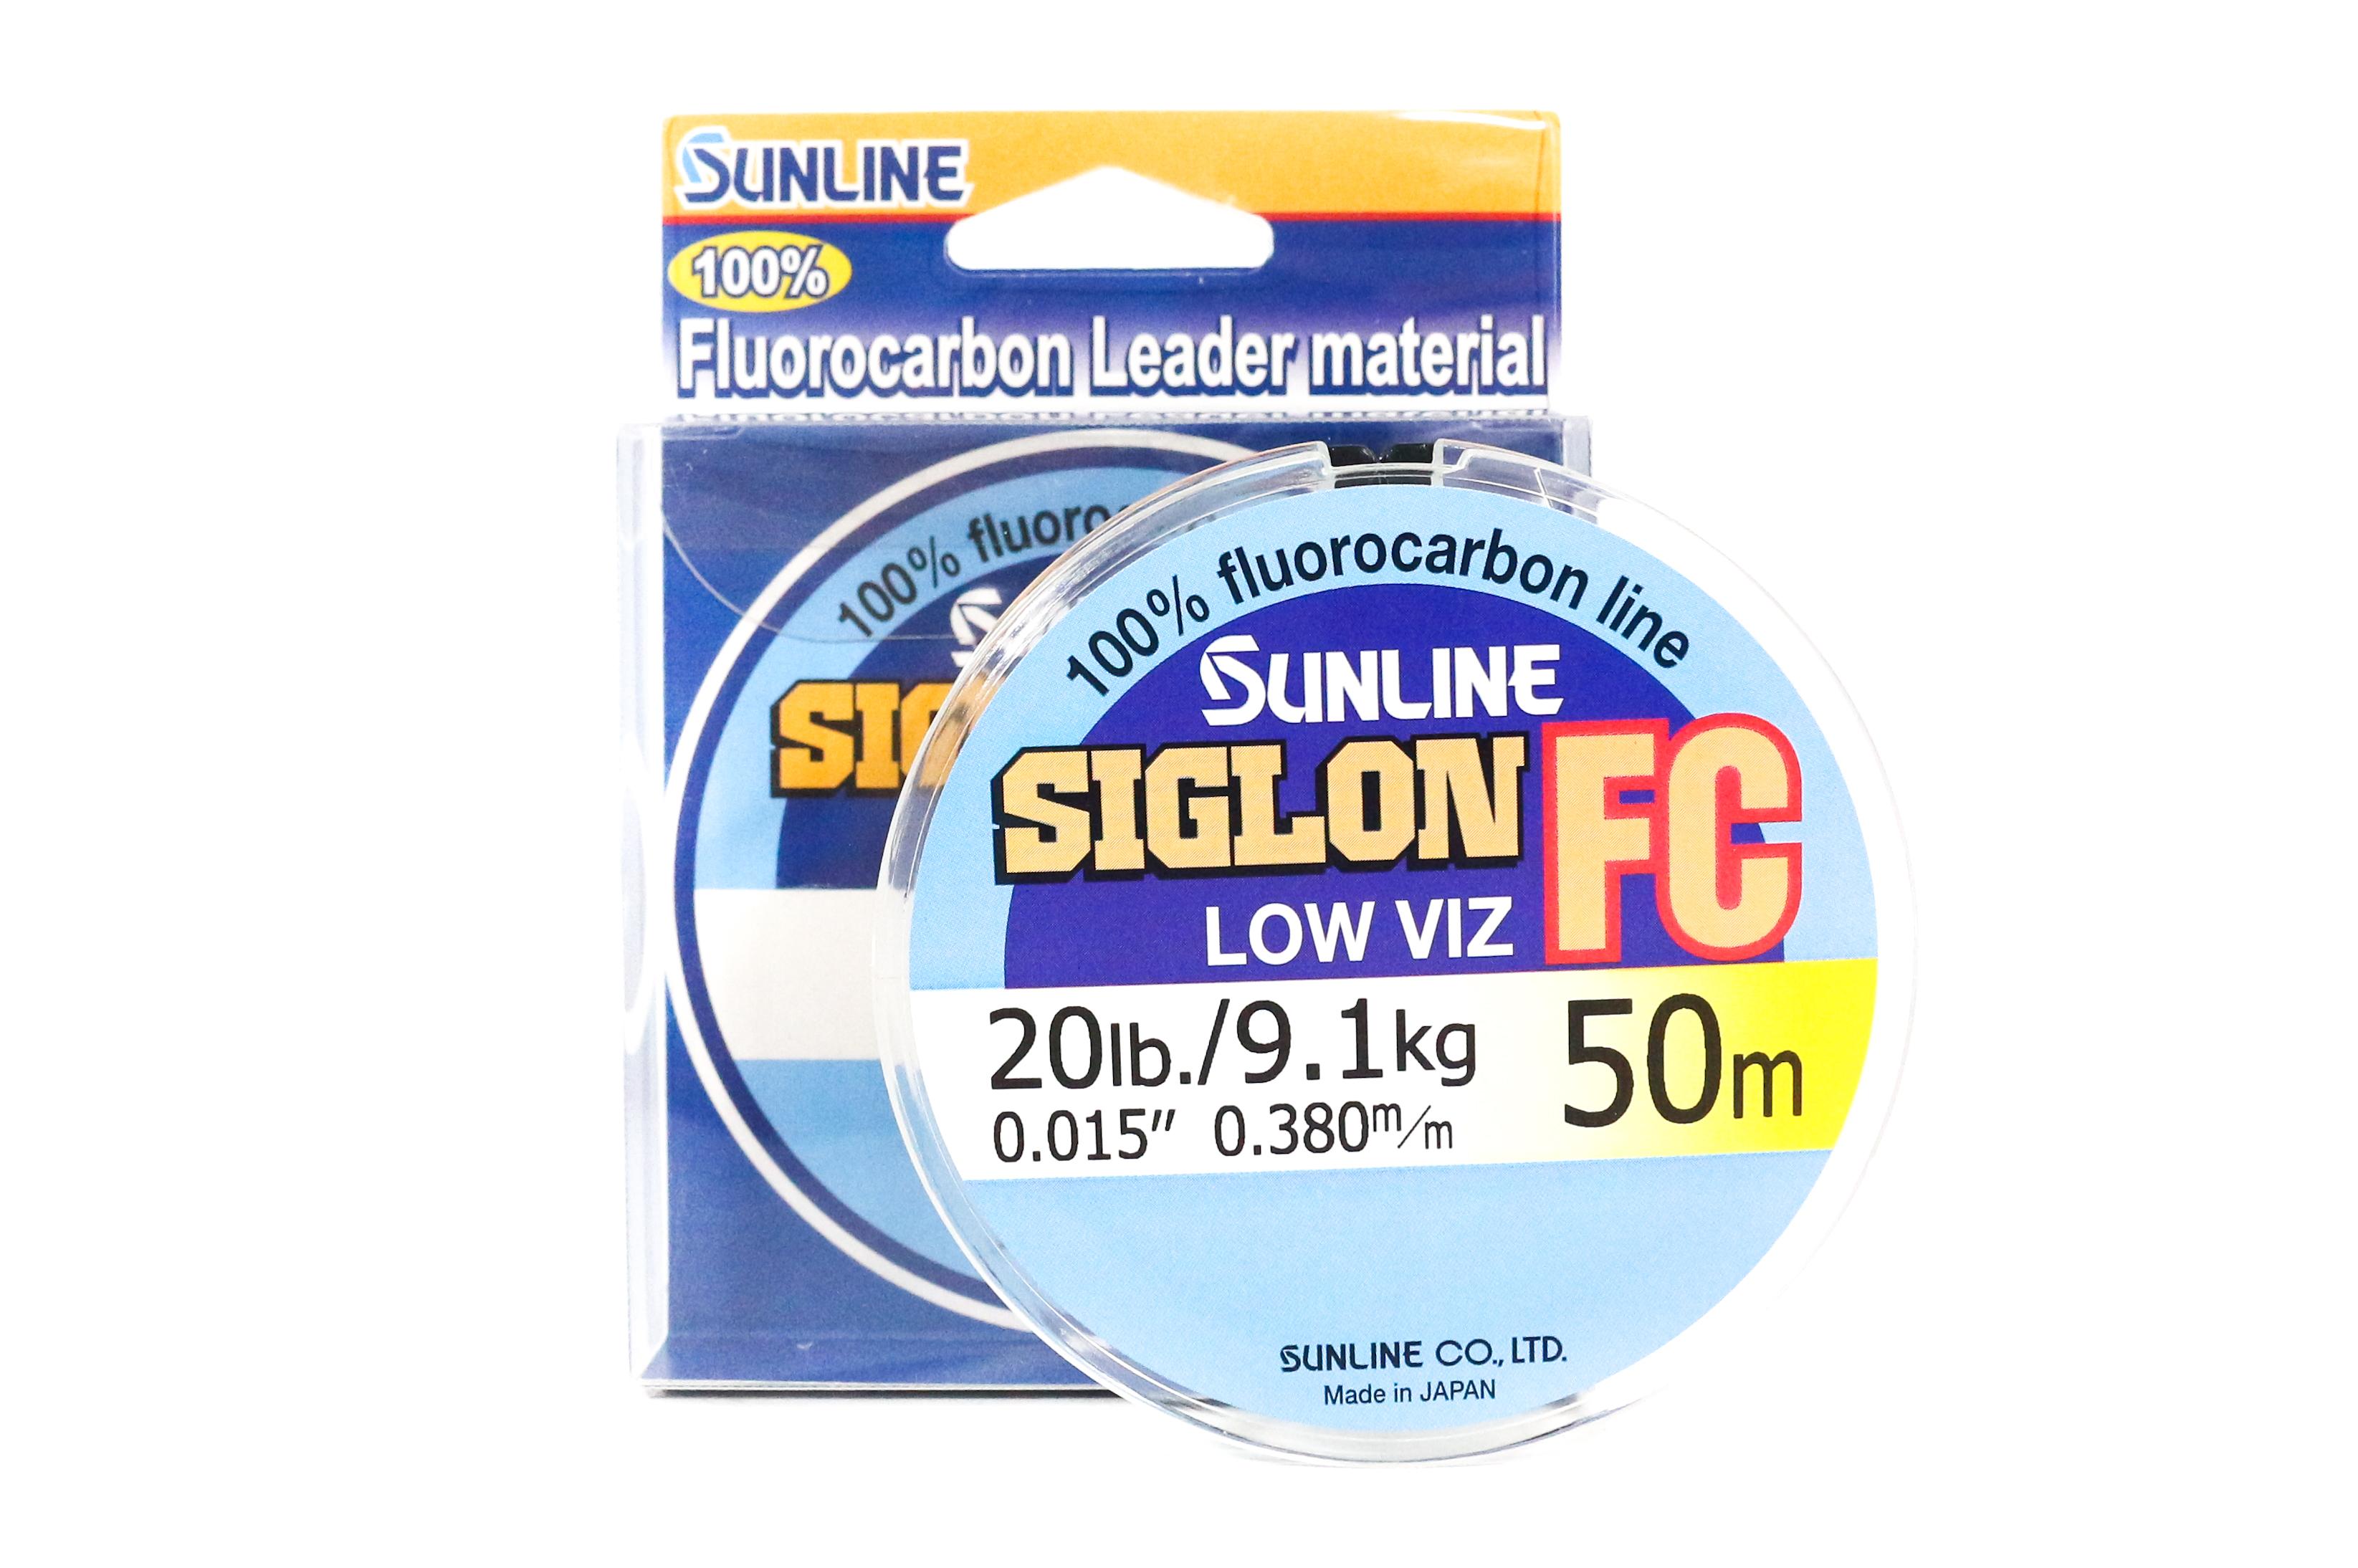 Sunline Siglon FC Fluorocarbon Line 50m 20lb Diameter 0.38 mm (5907)